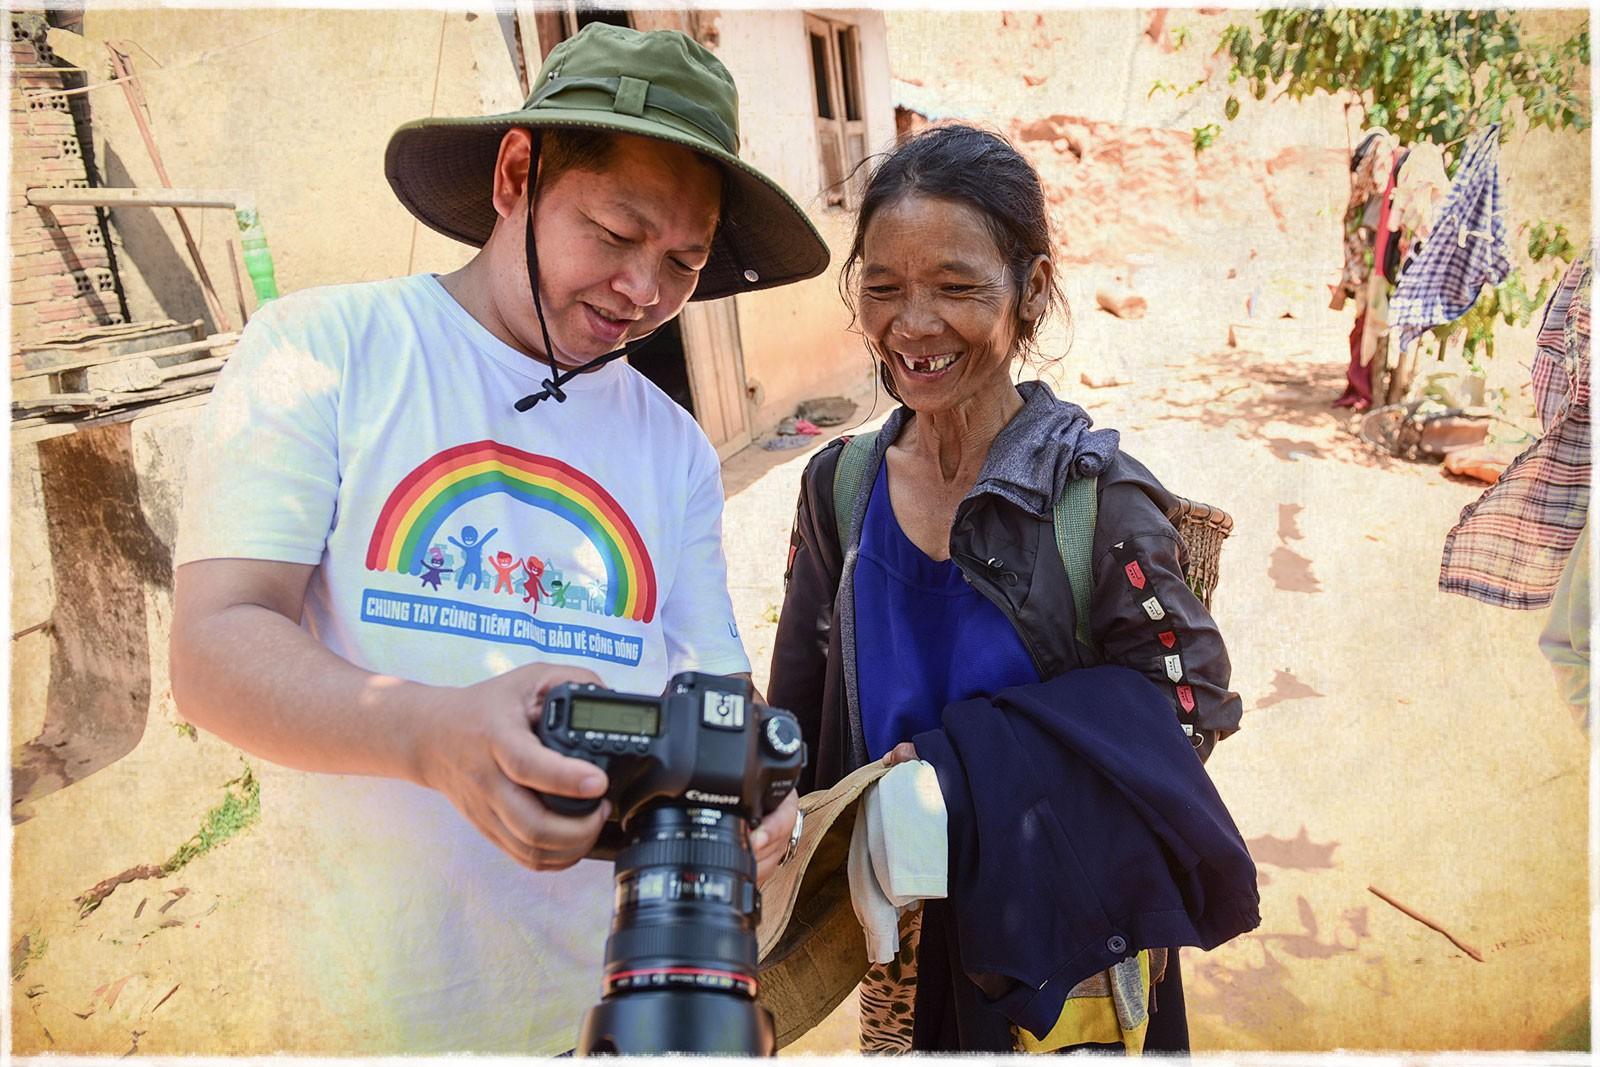 Ho Vinh Thang shows his photos of the trip to a local. Photo: Tuoi Tre